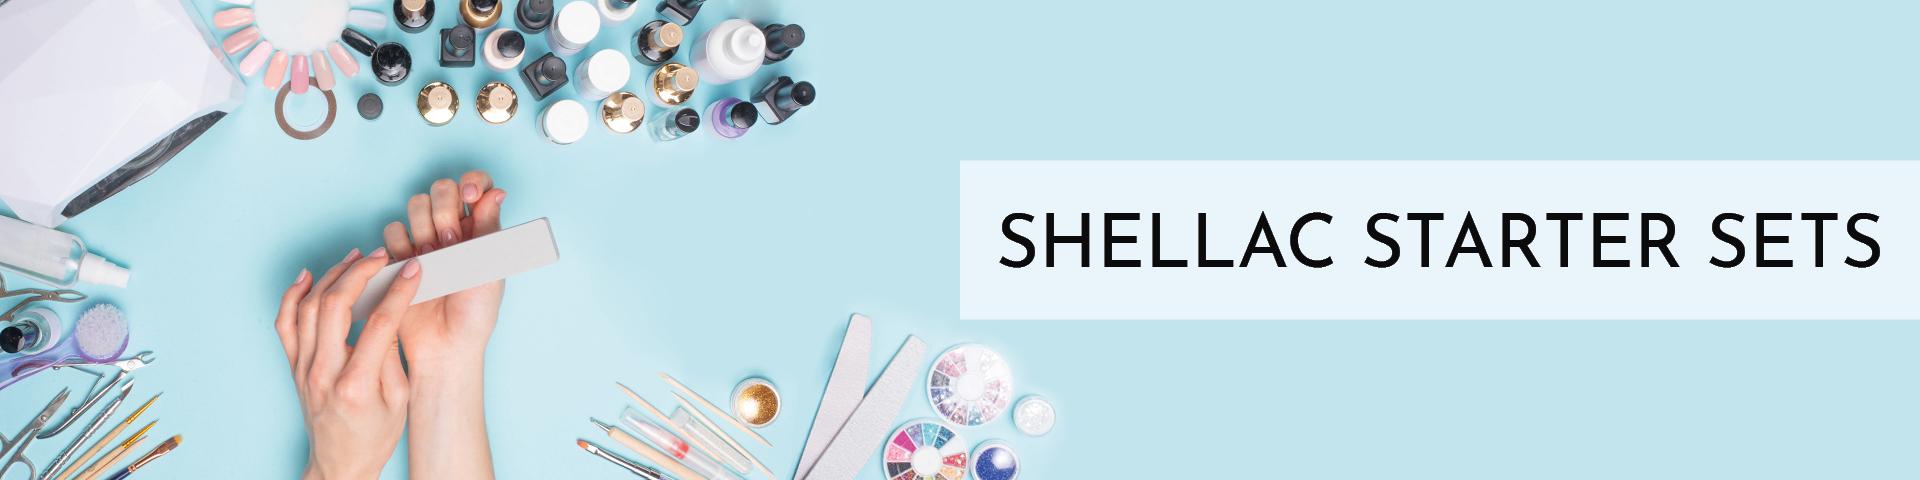 Shellac Starter Sets